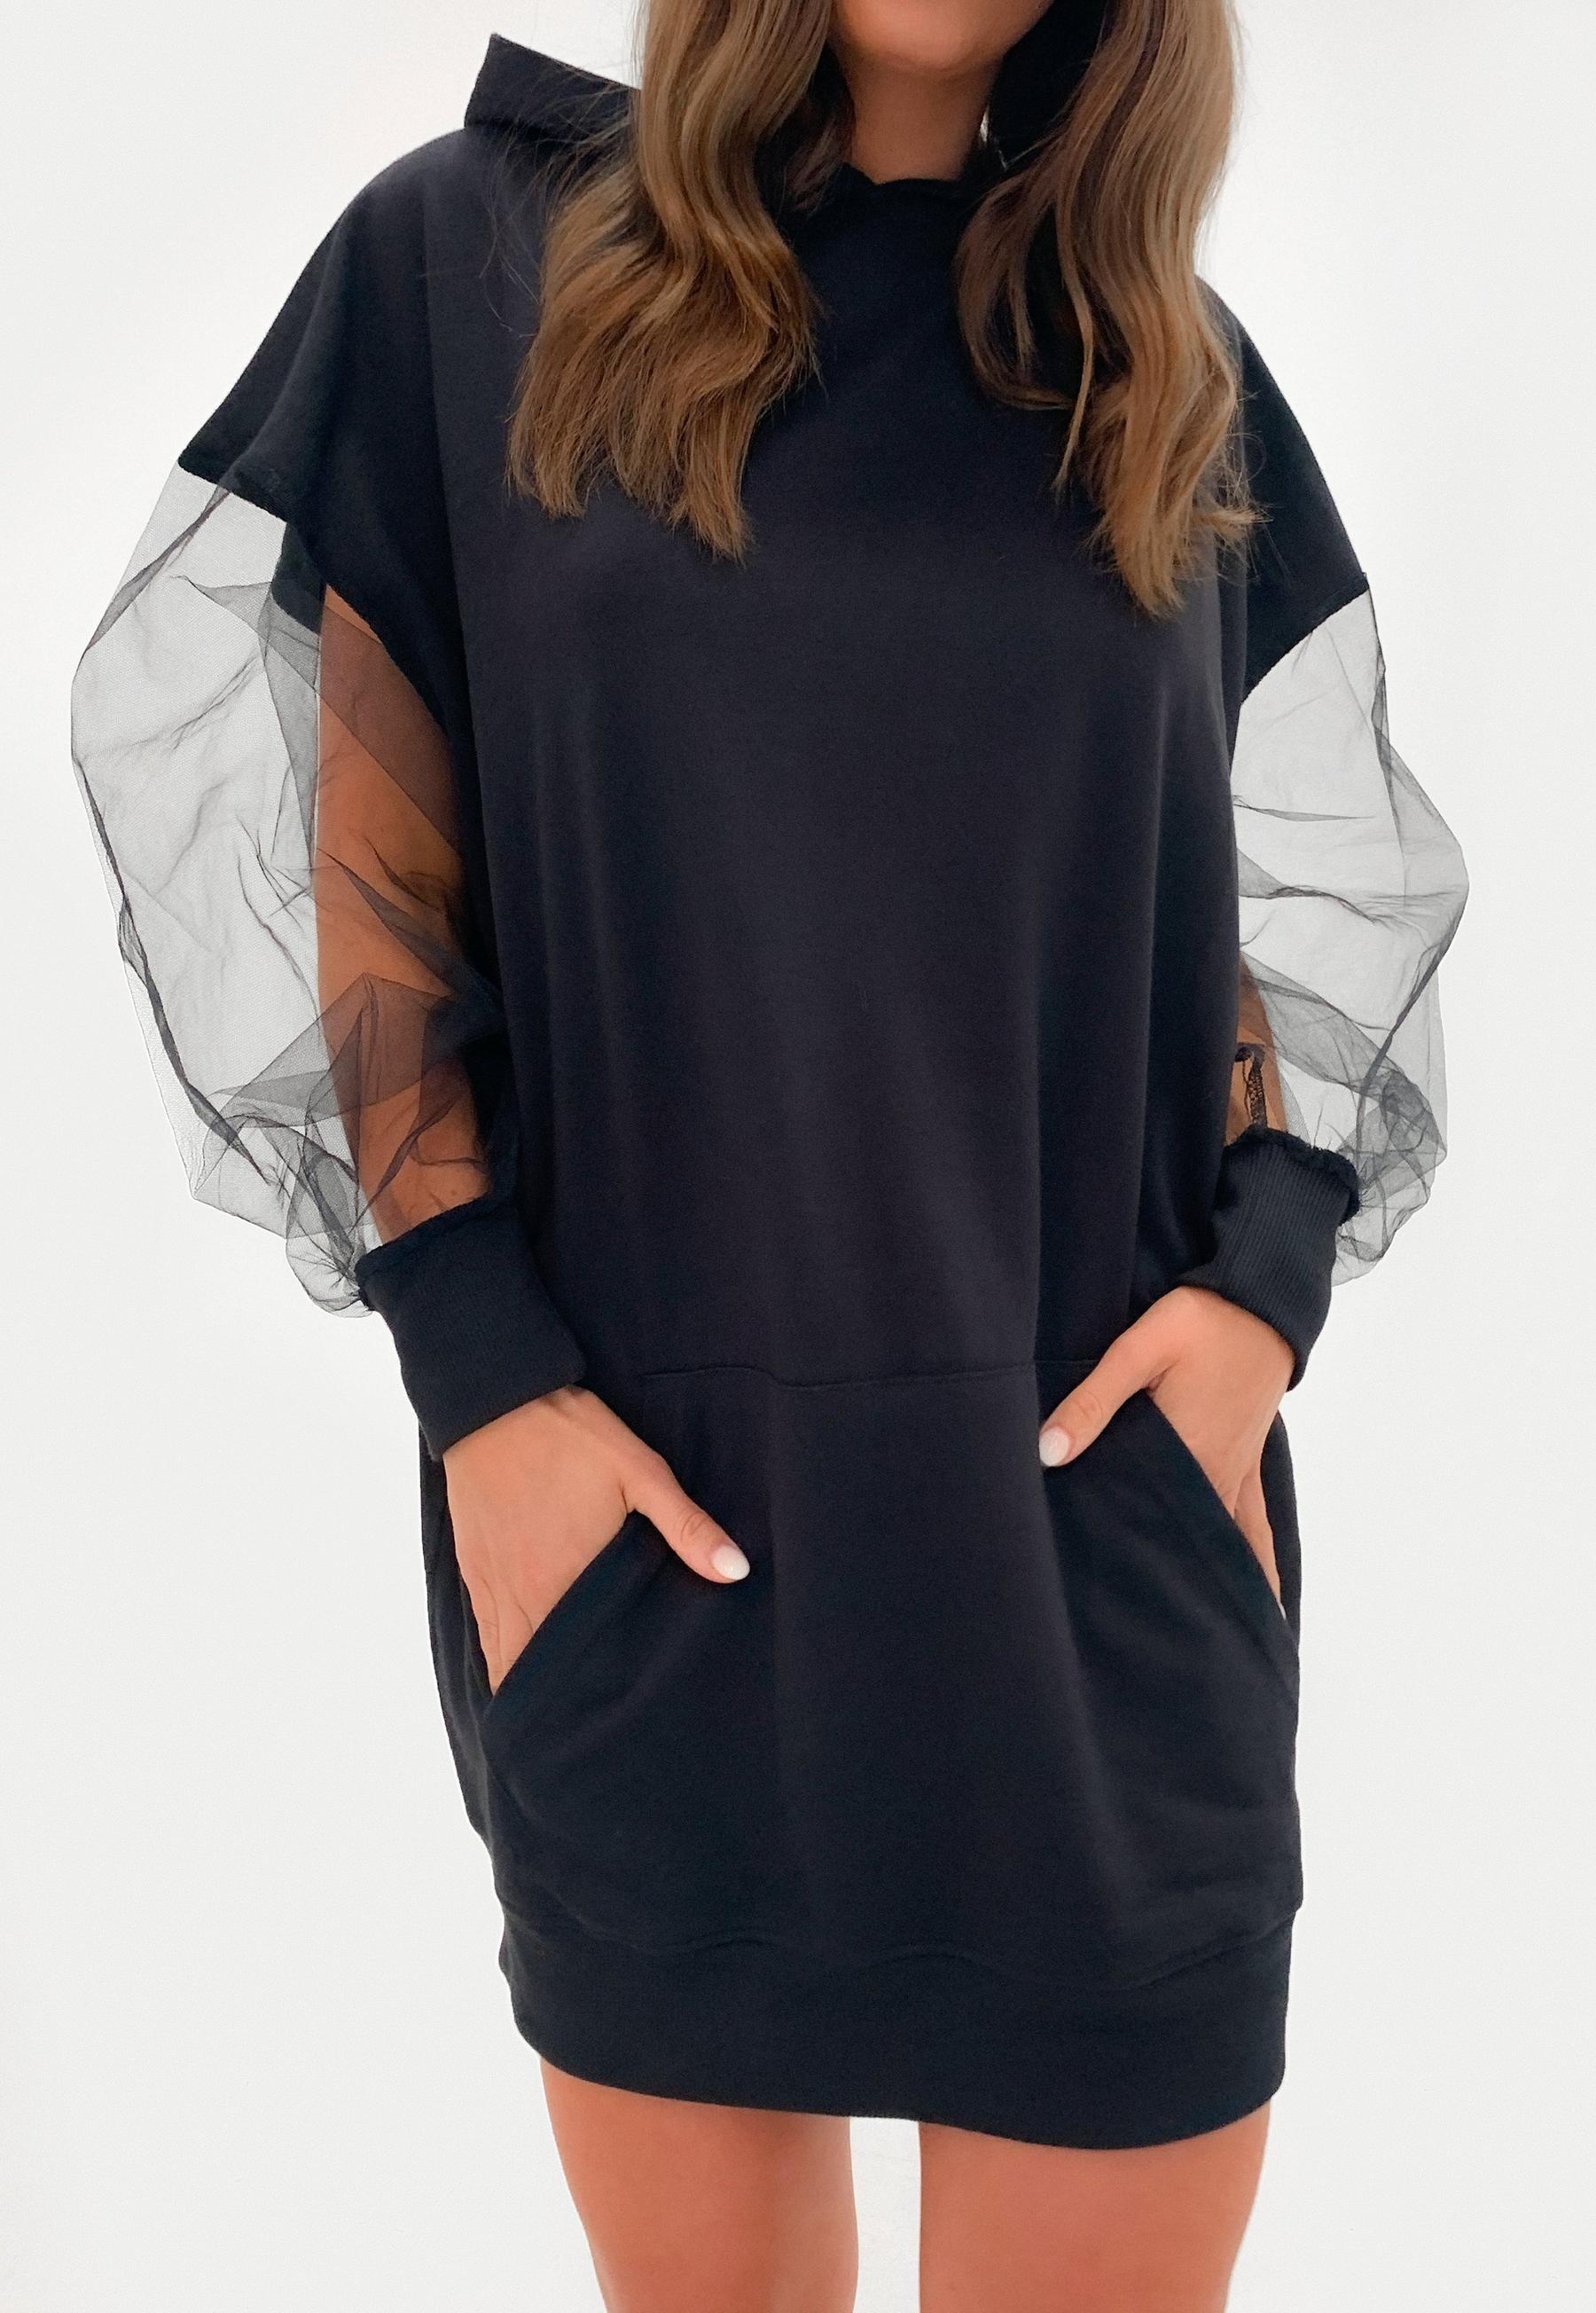 Model in the hoodie dress with sheer puffy sleeves